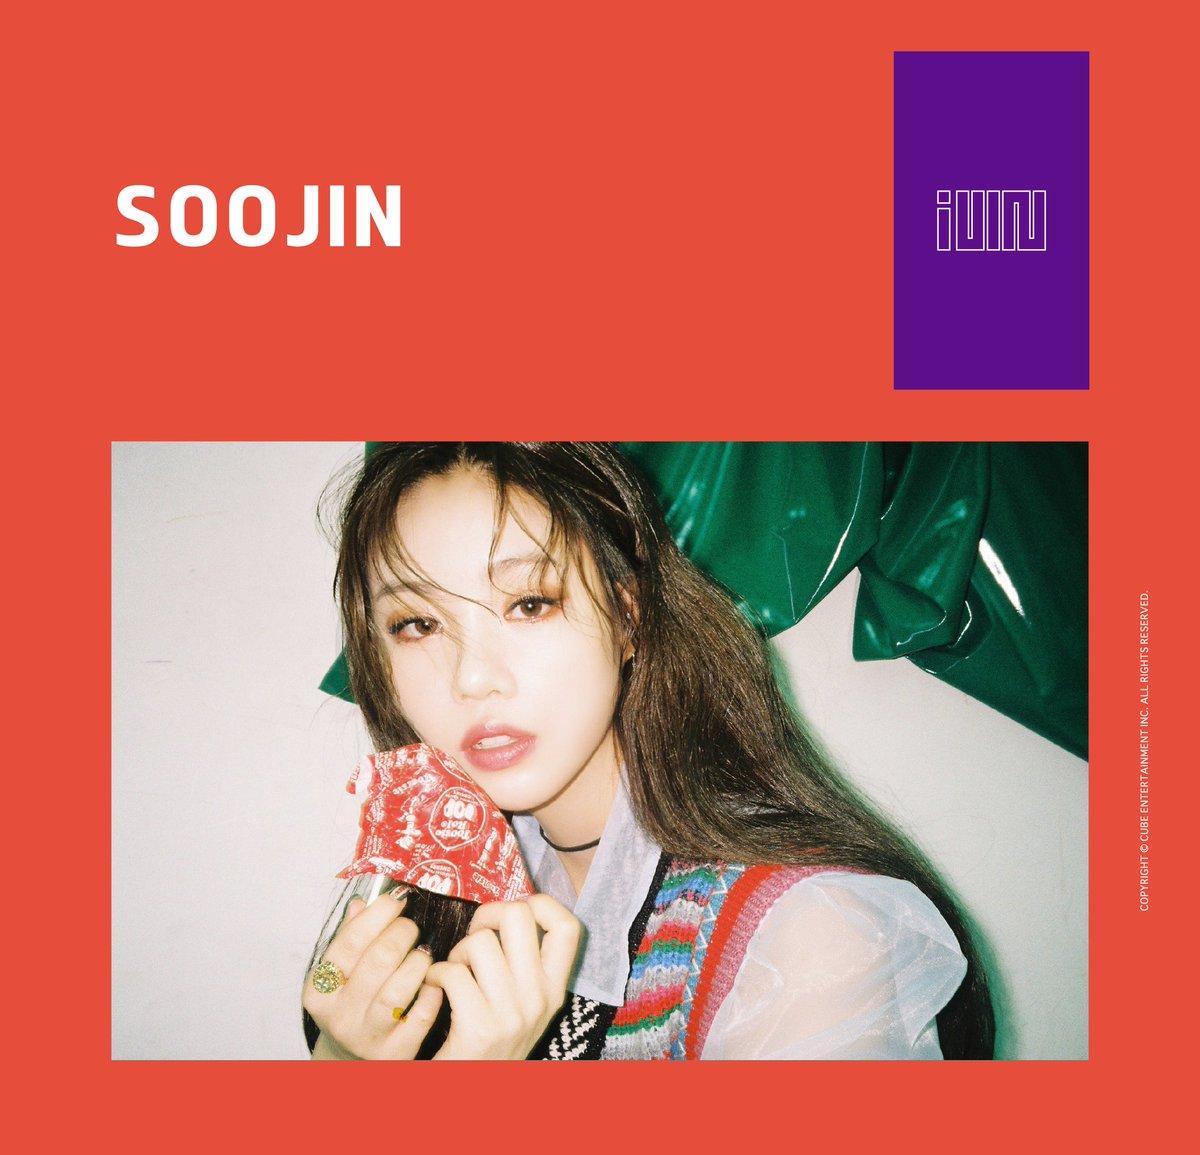 I-DLE/ IDLE (GIRL-I-DLE) >> Preparando Debut Idle-soojin